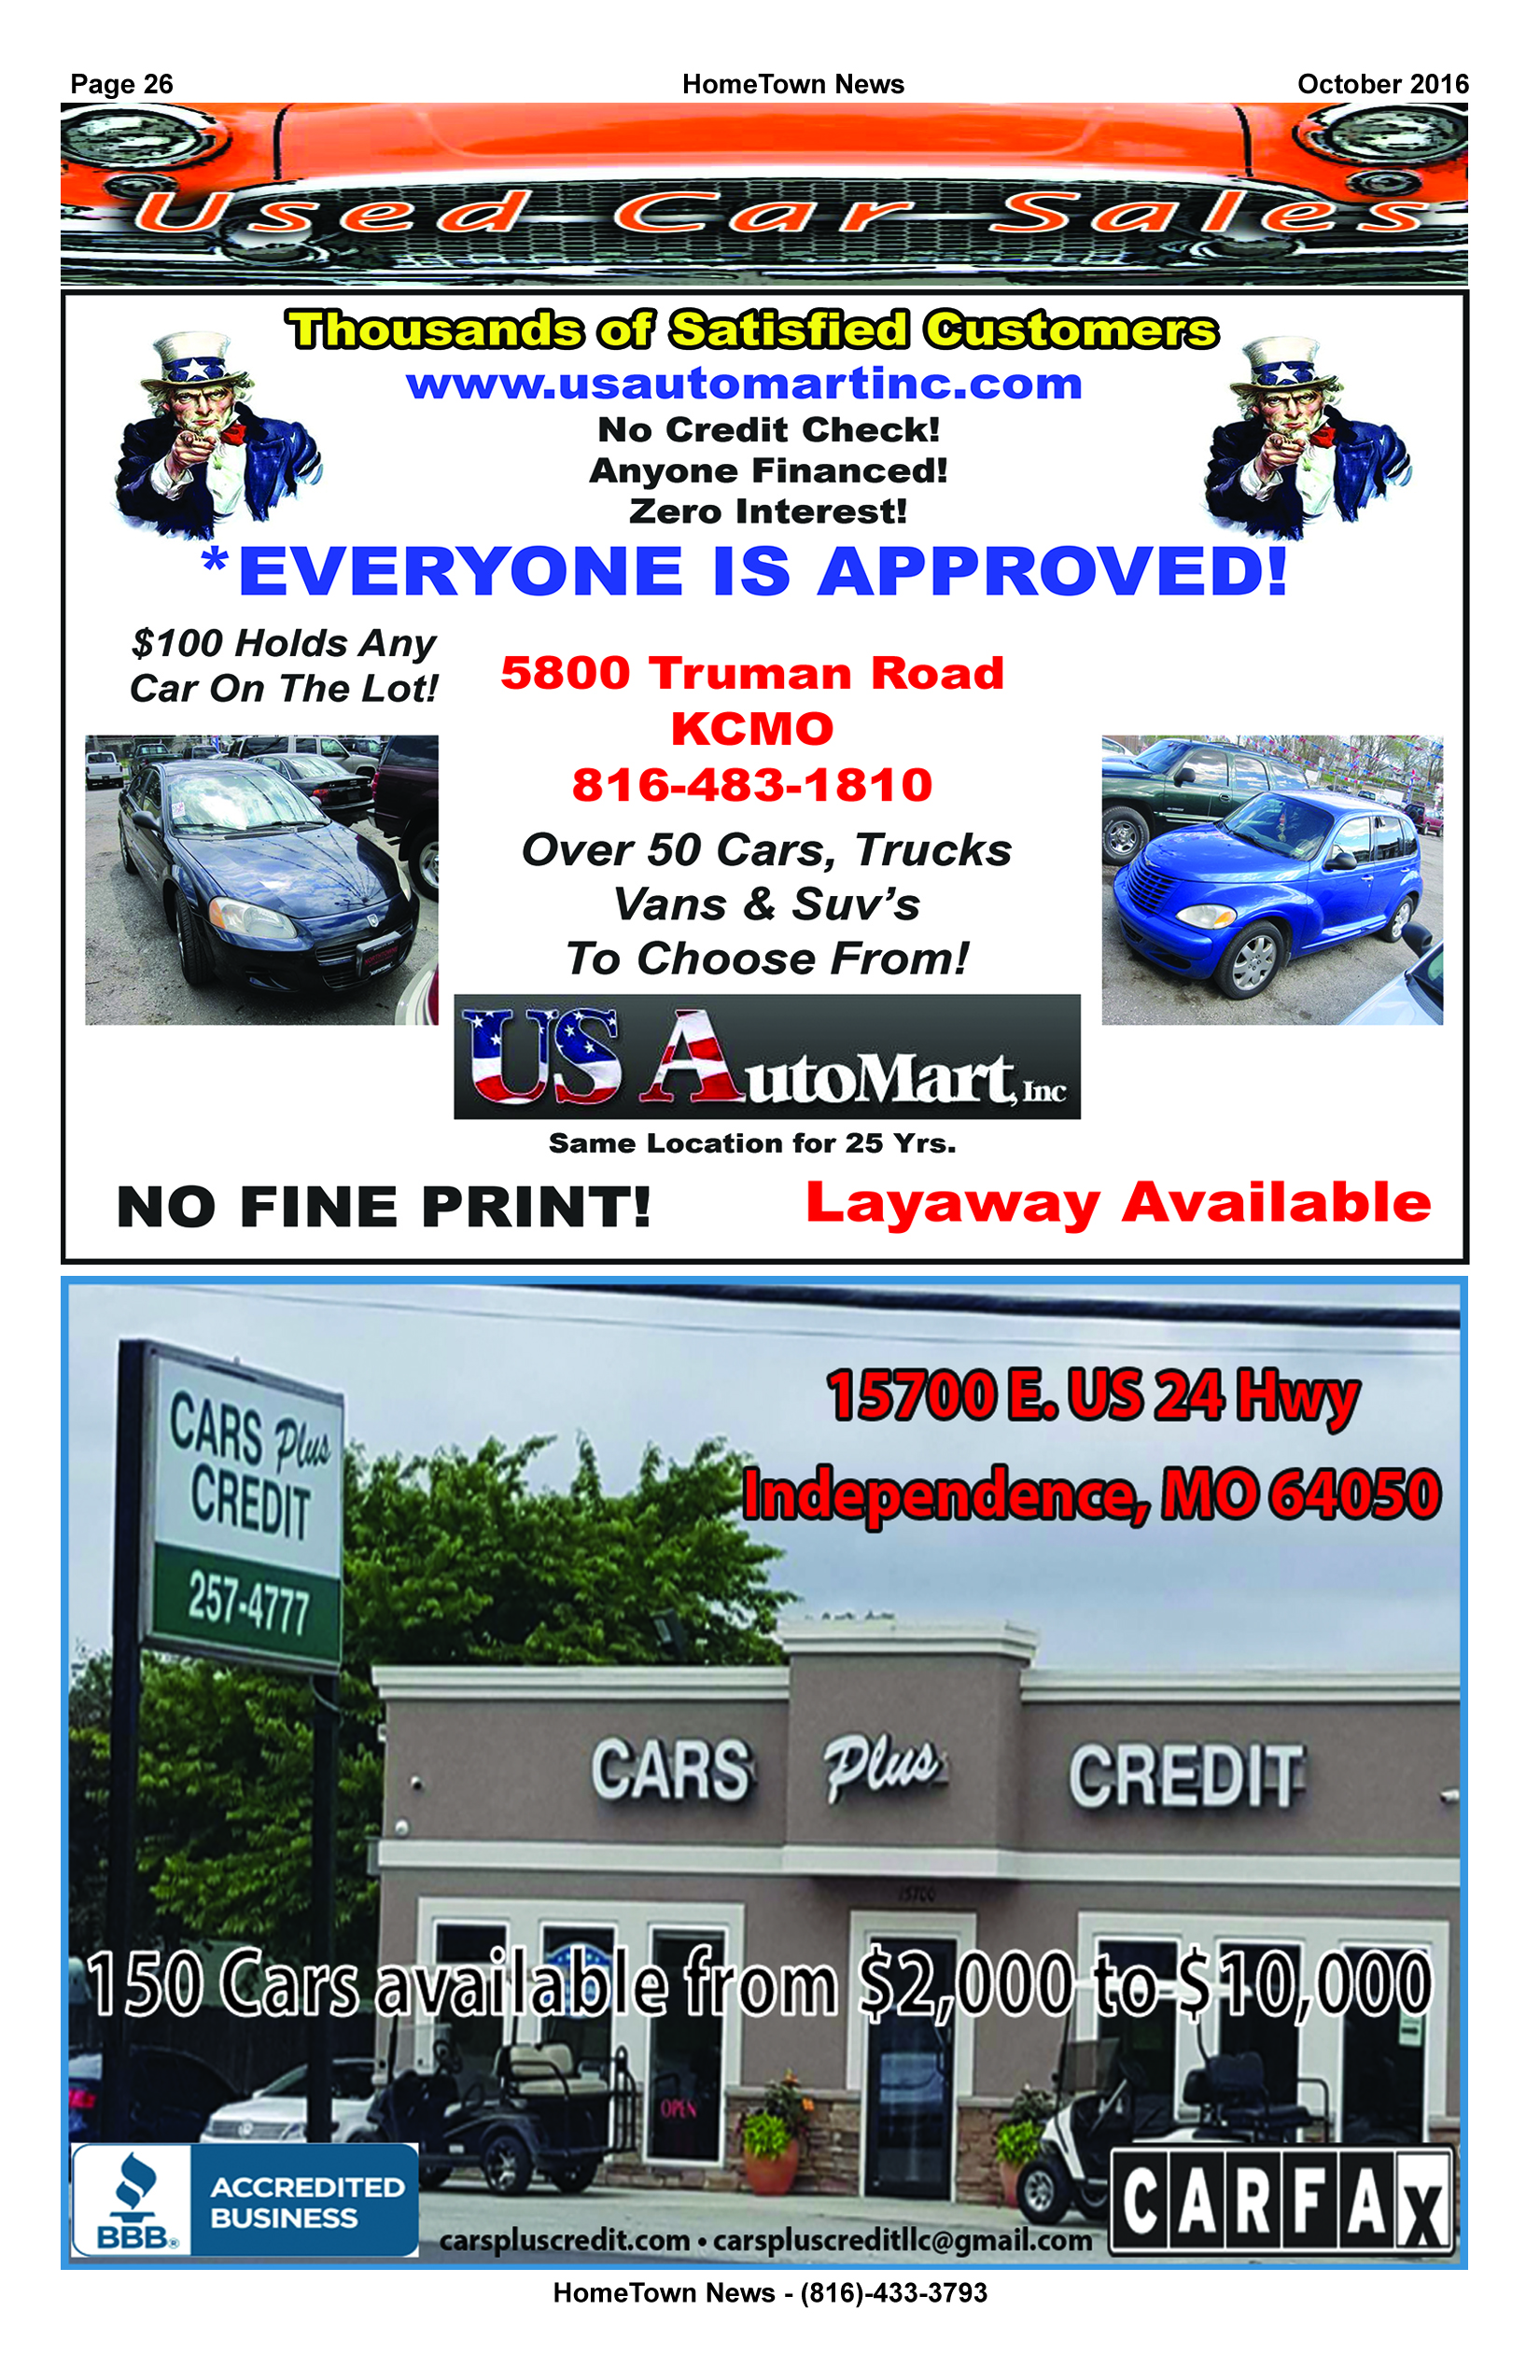 HTN15 - 26 - Auto Sales